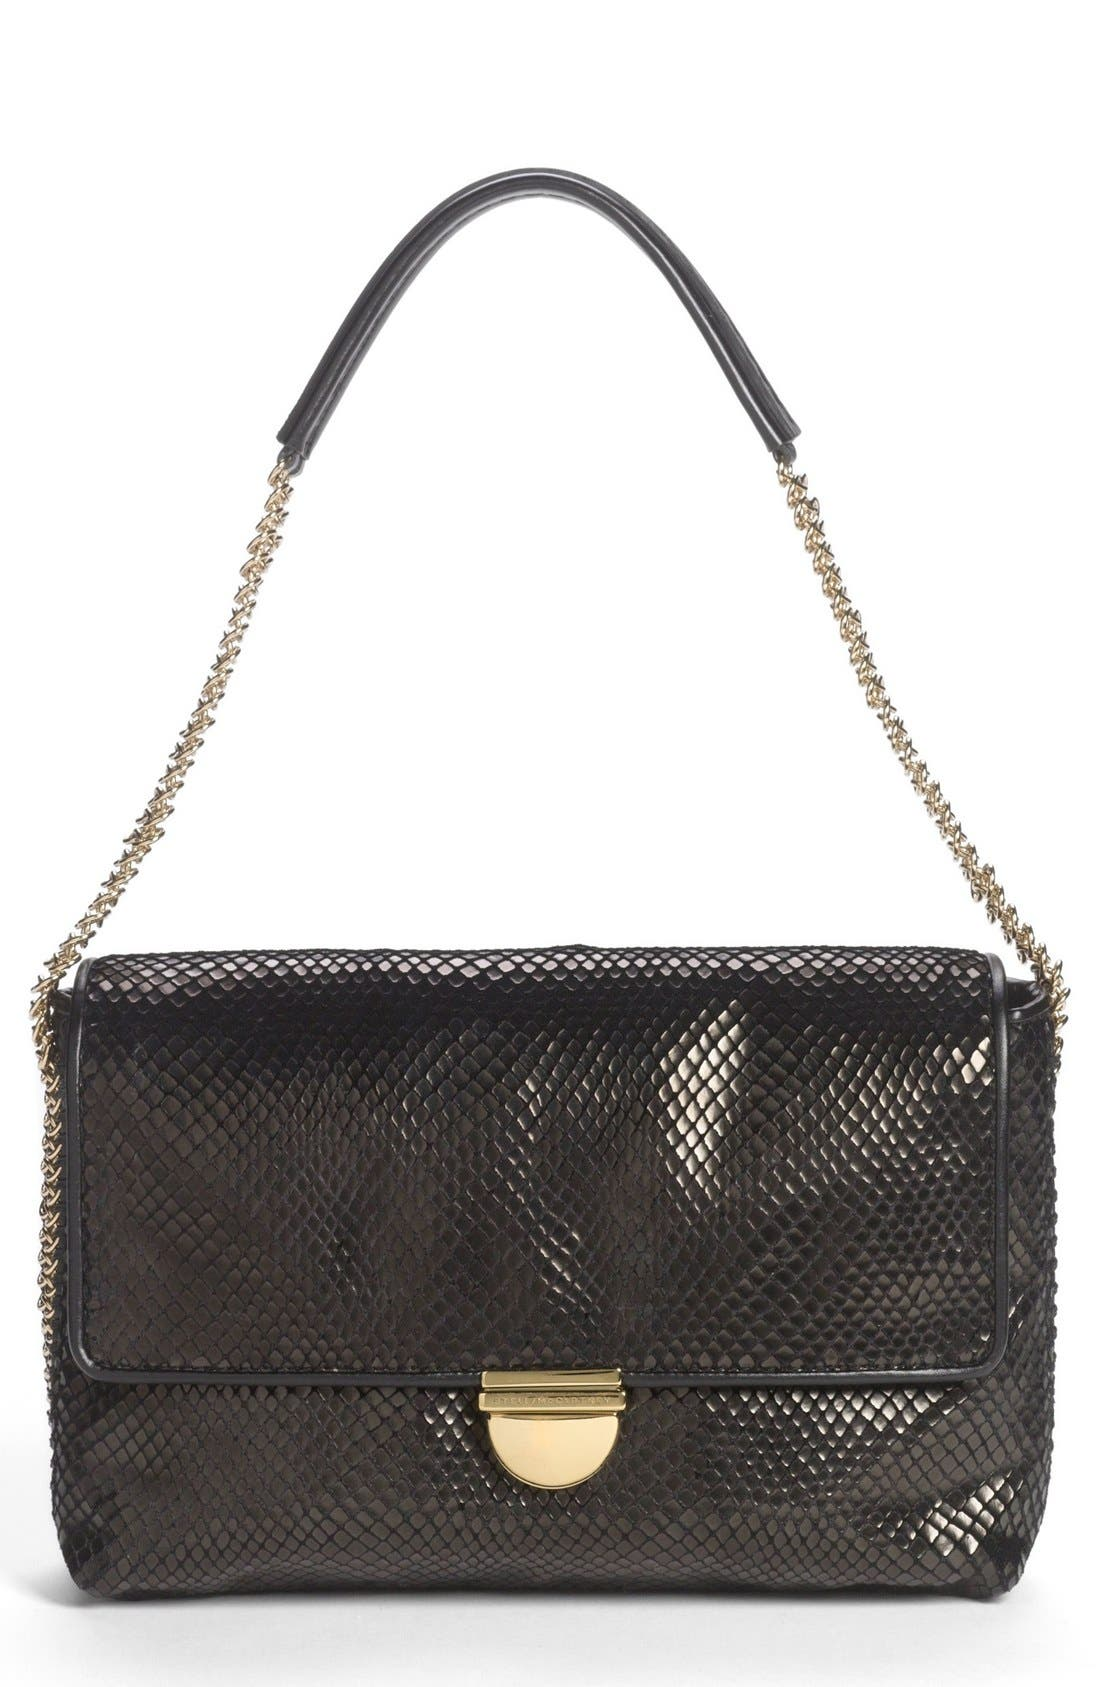 Main Image - Stella McCartney 'Boo' Shoulder Bag